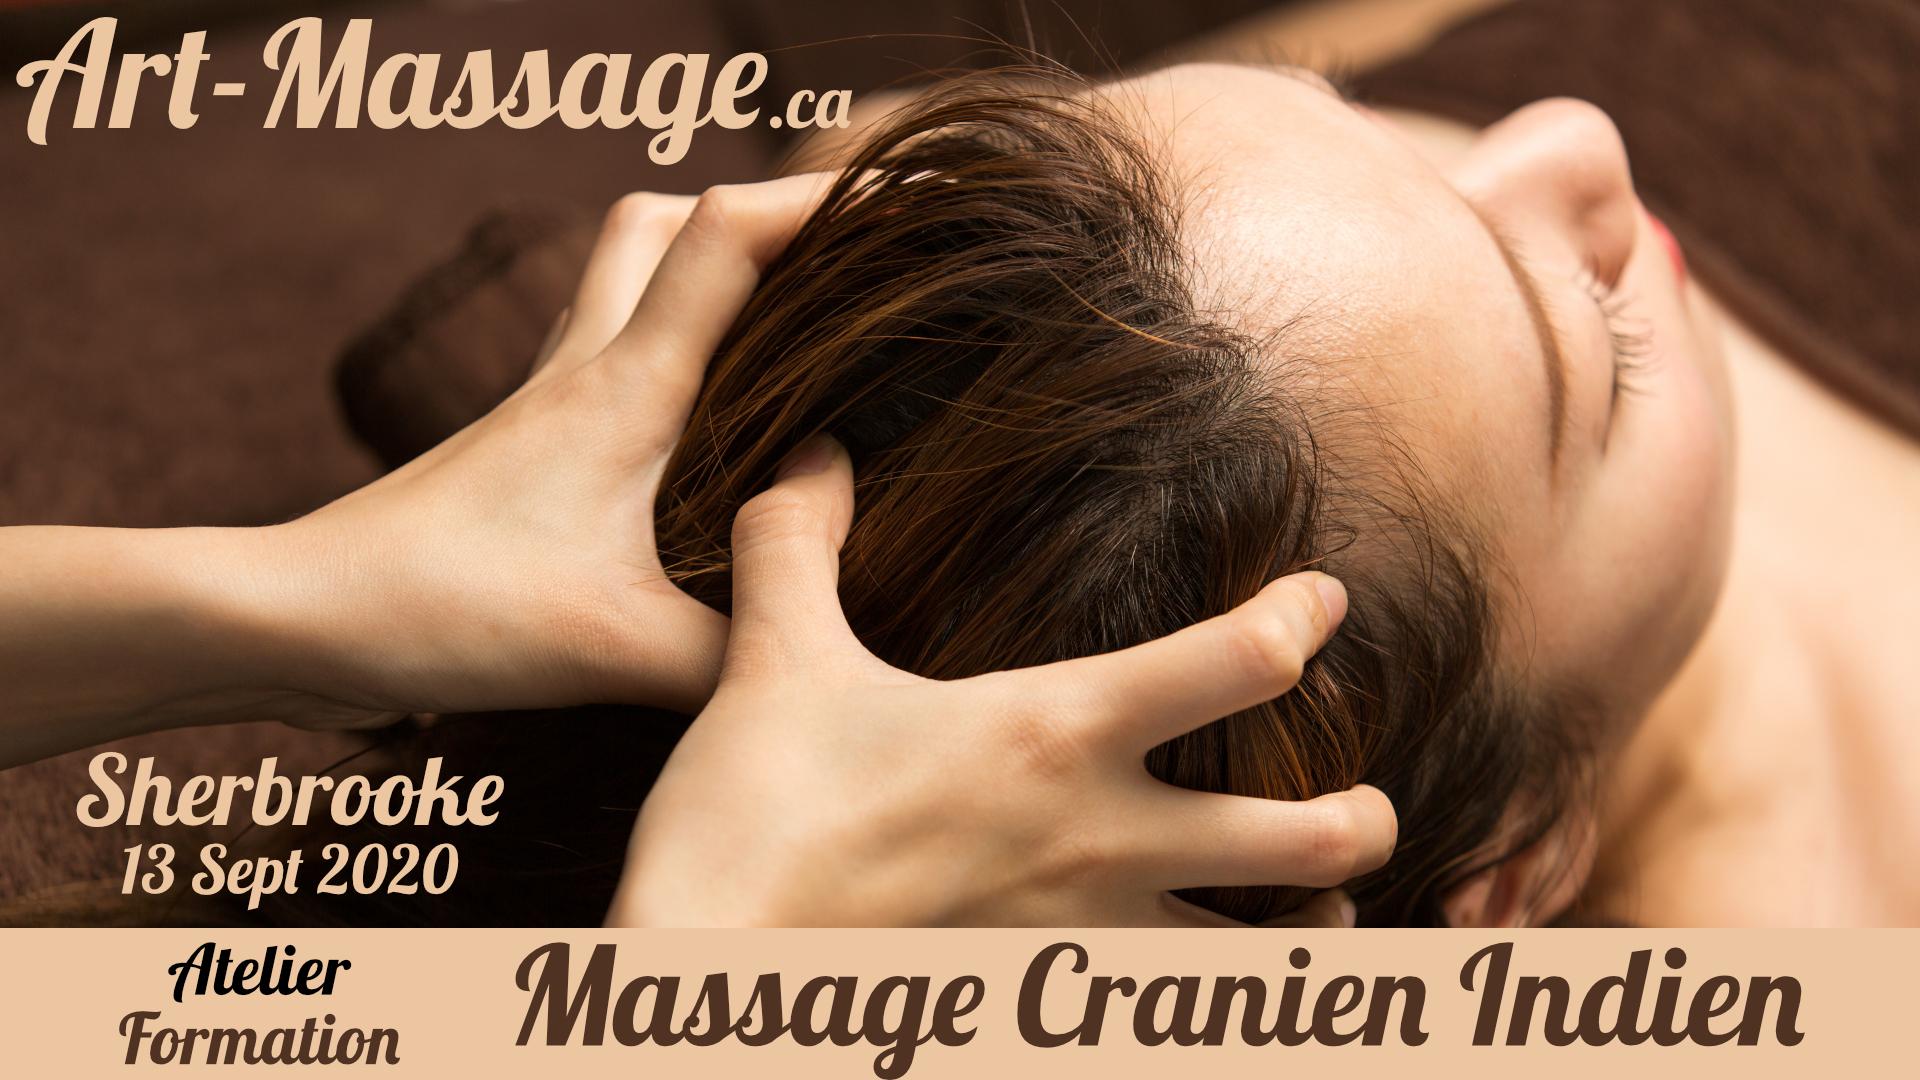 Massage Cranien Indien à Sherbrooke!